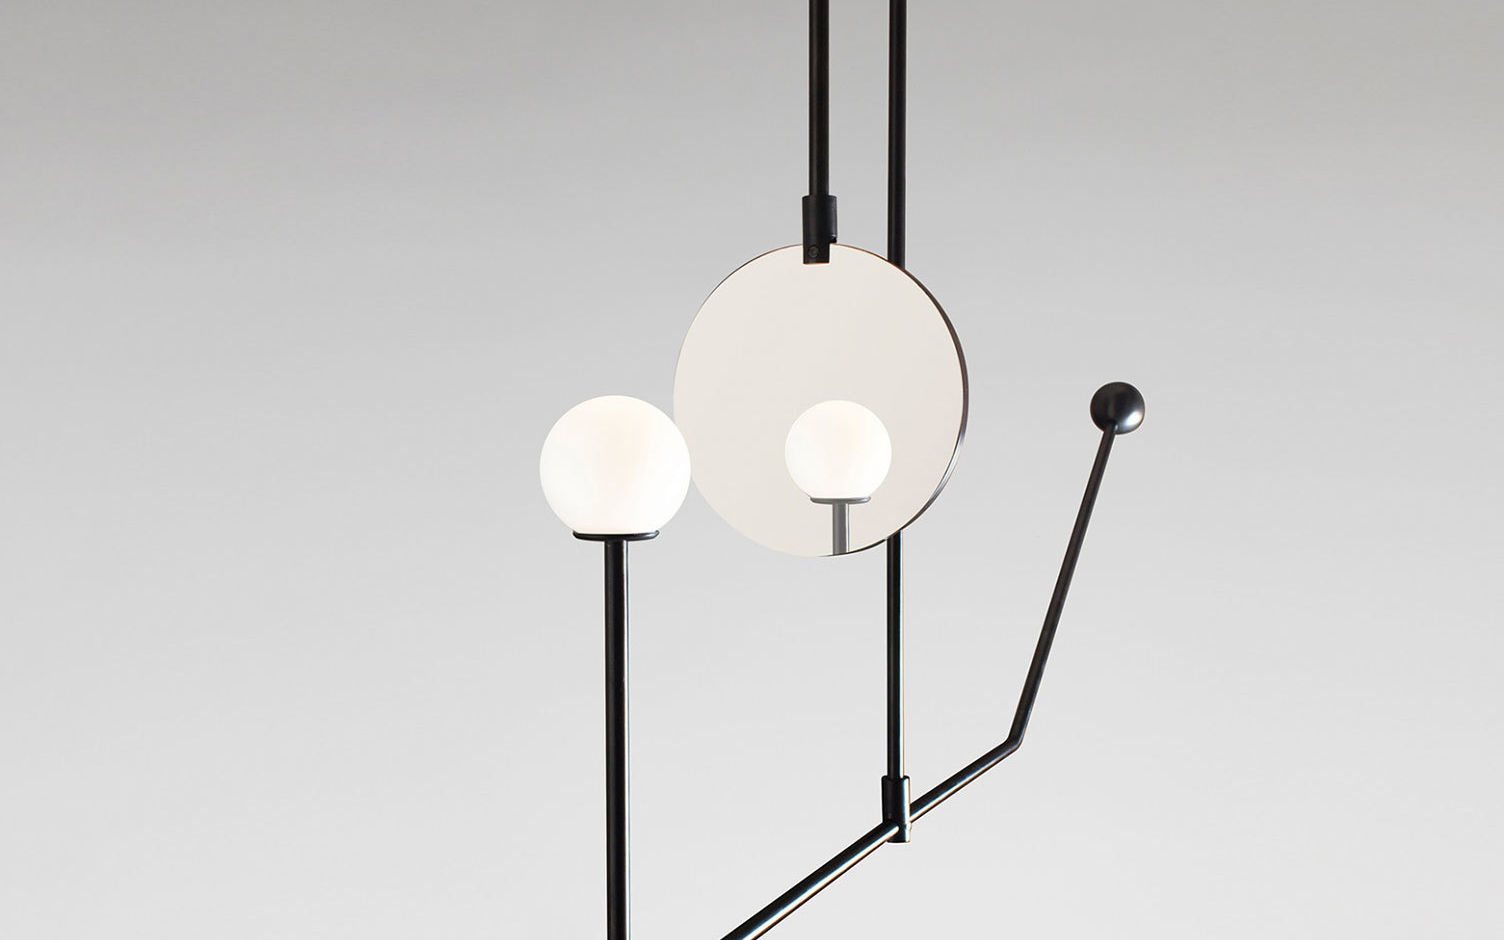 Bespoke Lighting catalogue image